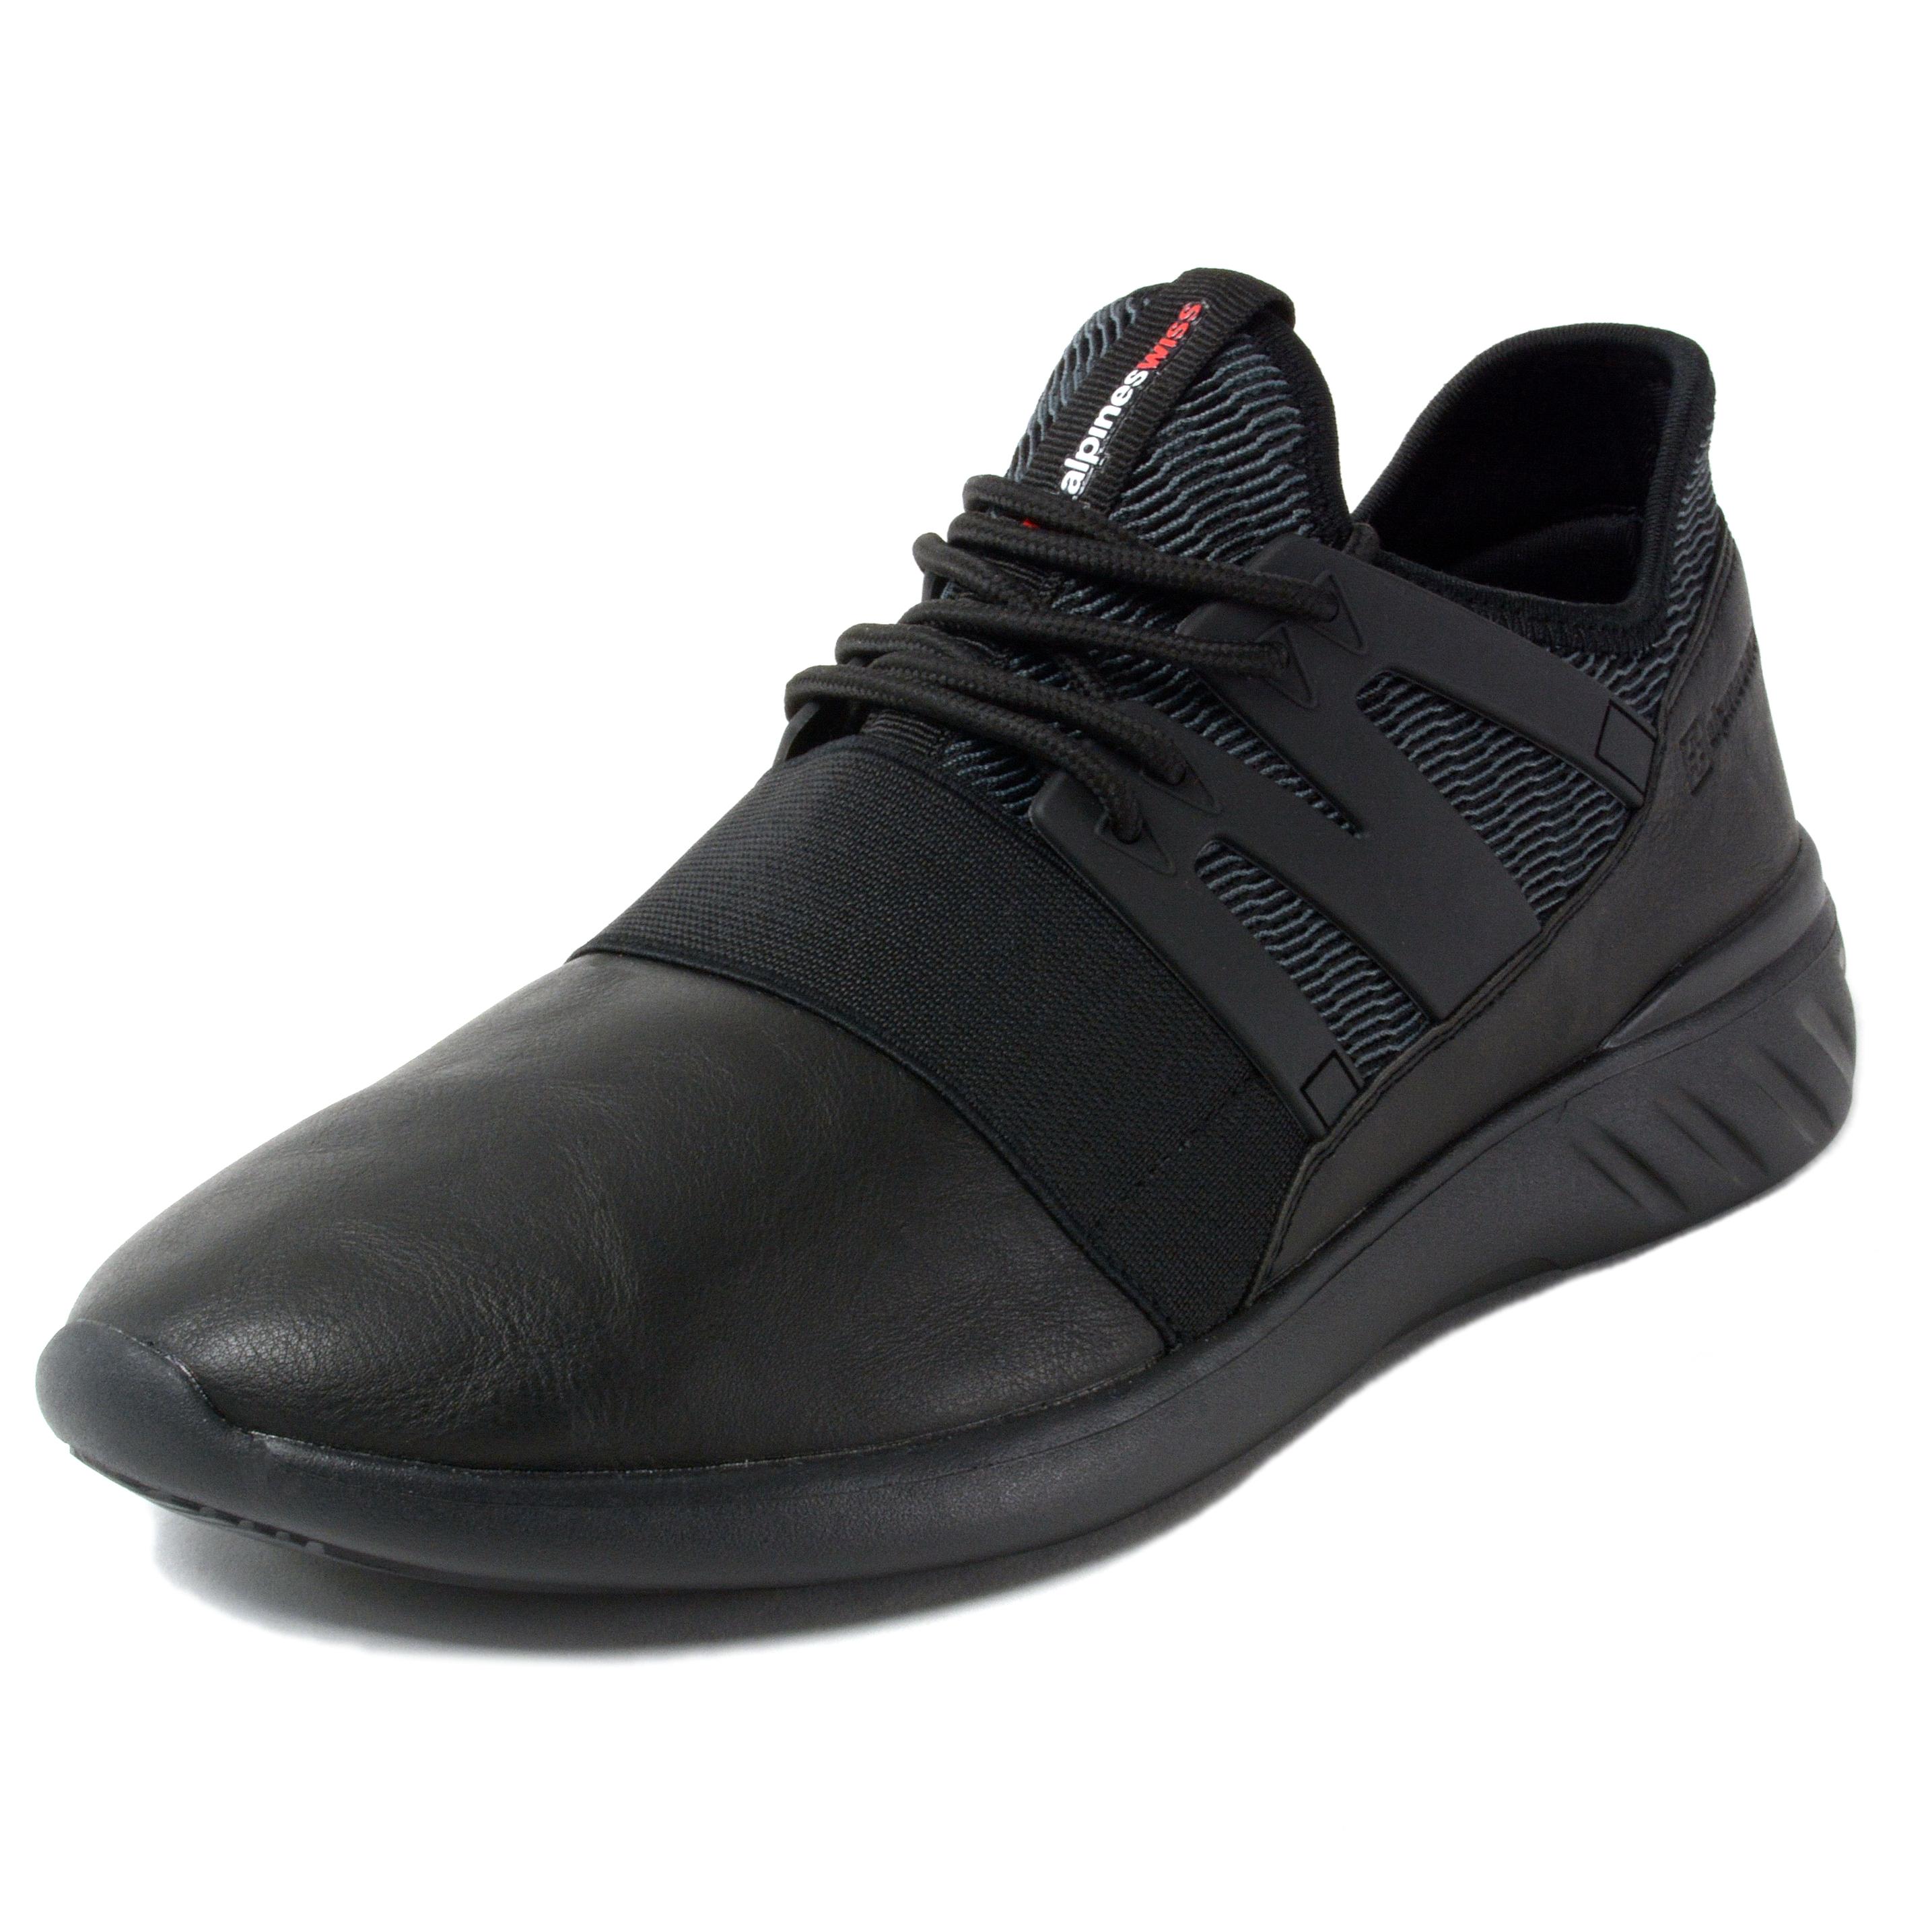 Alpine-Swiss-Josef-Men-Tennis-Shoes-Low-Top-Sneakers-Flex-Strap-Mesh-Knit-Collar